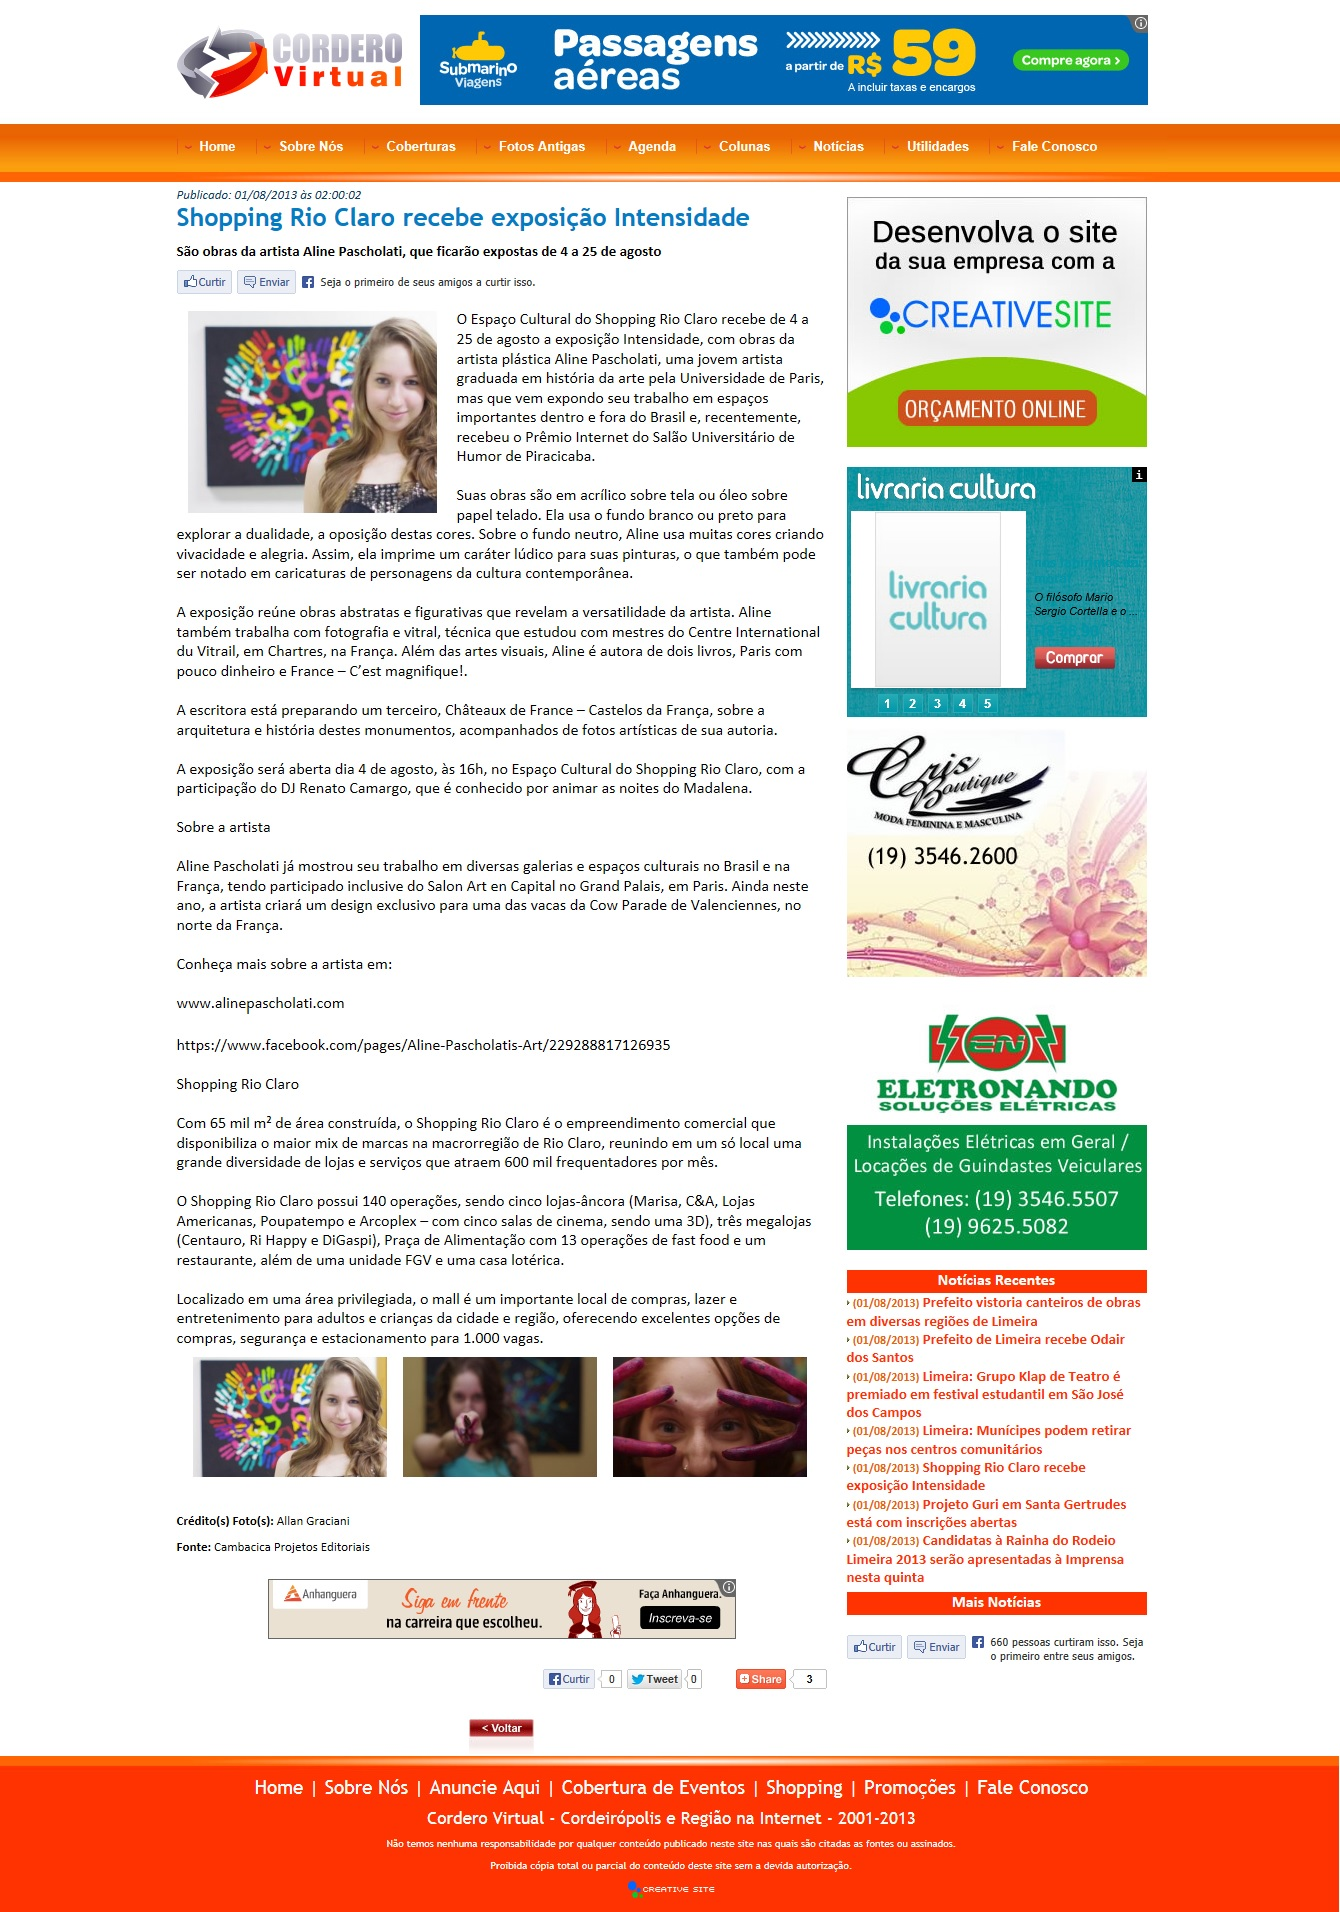 Website Cordero Virtual